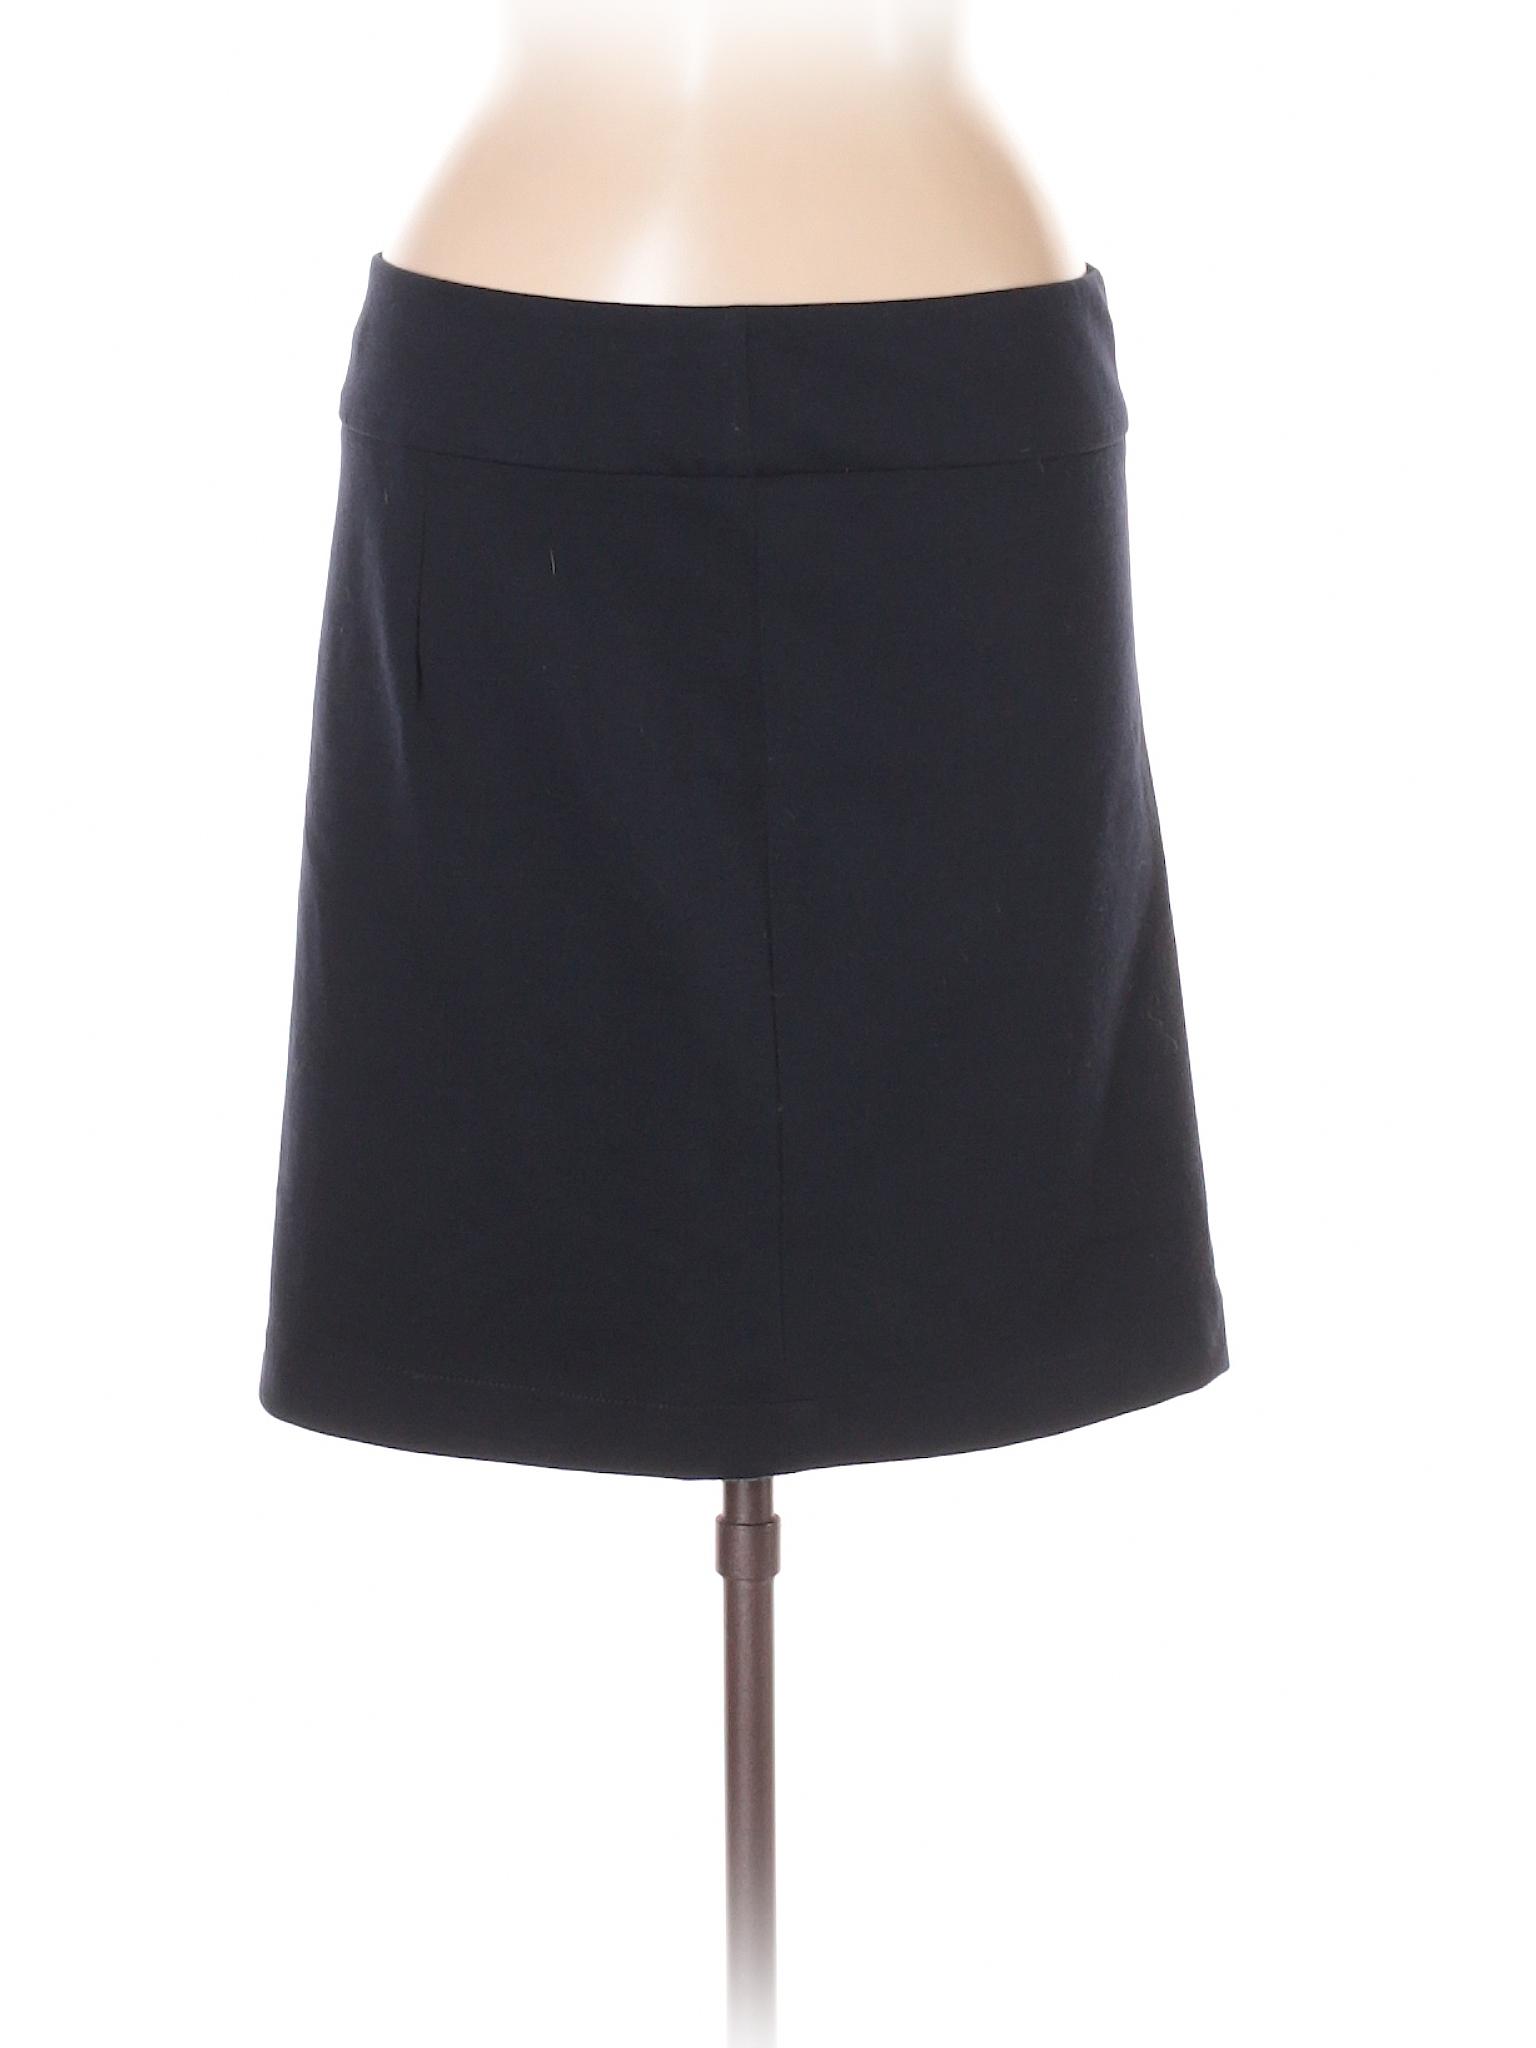 Skirt Skirt Boutique Boutique Casual Casual Casual Boutique dwZaxdg